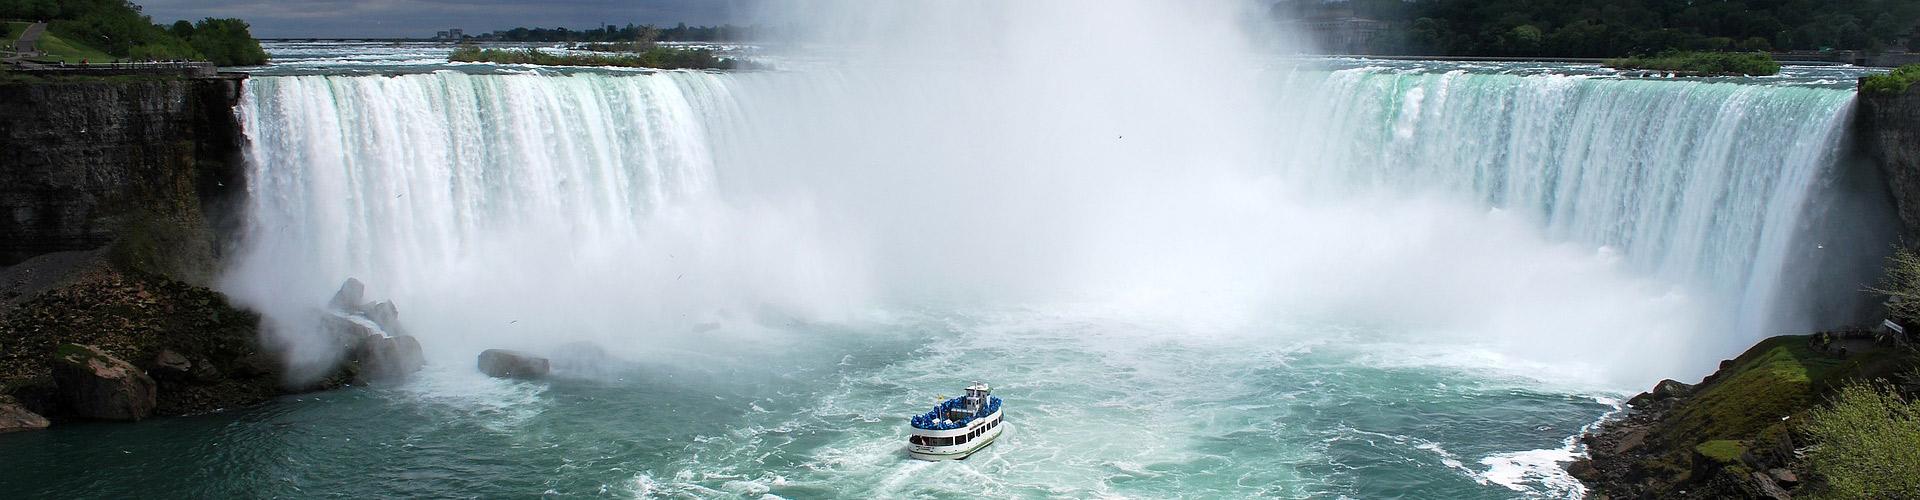 niagra-falls-bethel-tour-vacations-jehovahs